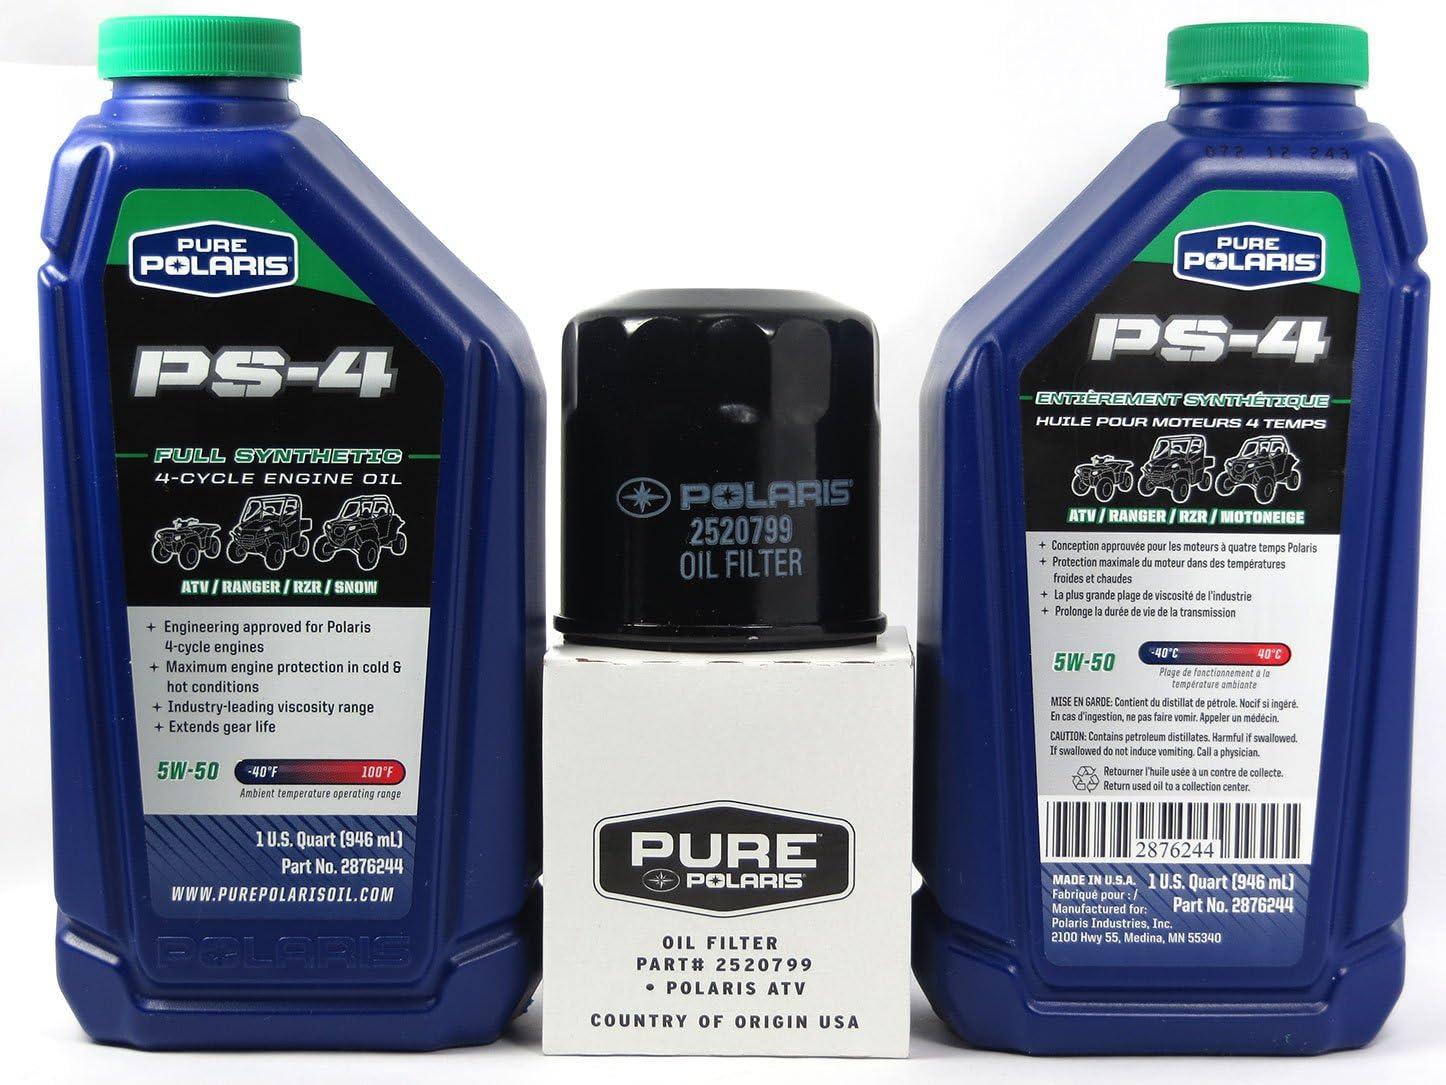 Road Passion Filtro de aceite para POLARIS SPORTSMAN 335 334 1999-2001 WORKER 335 335 1999